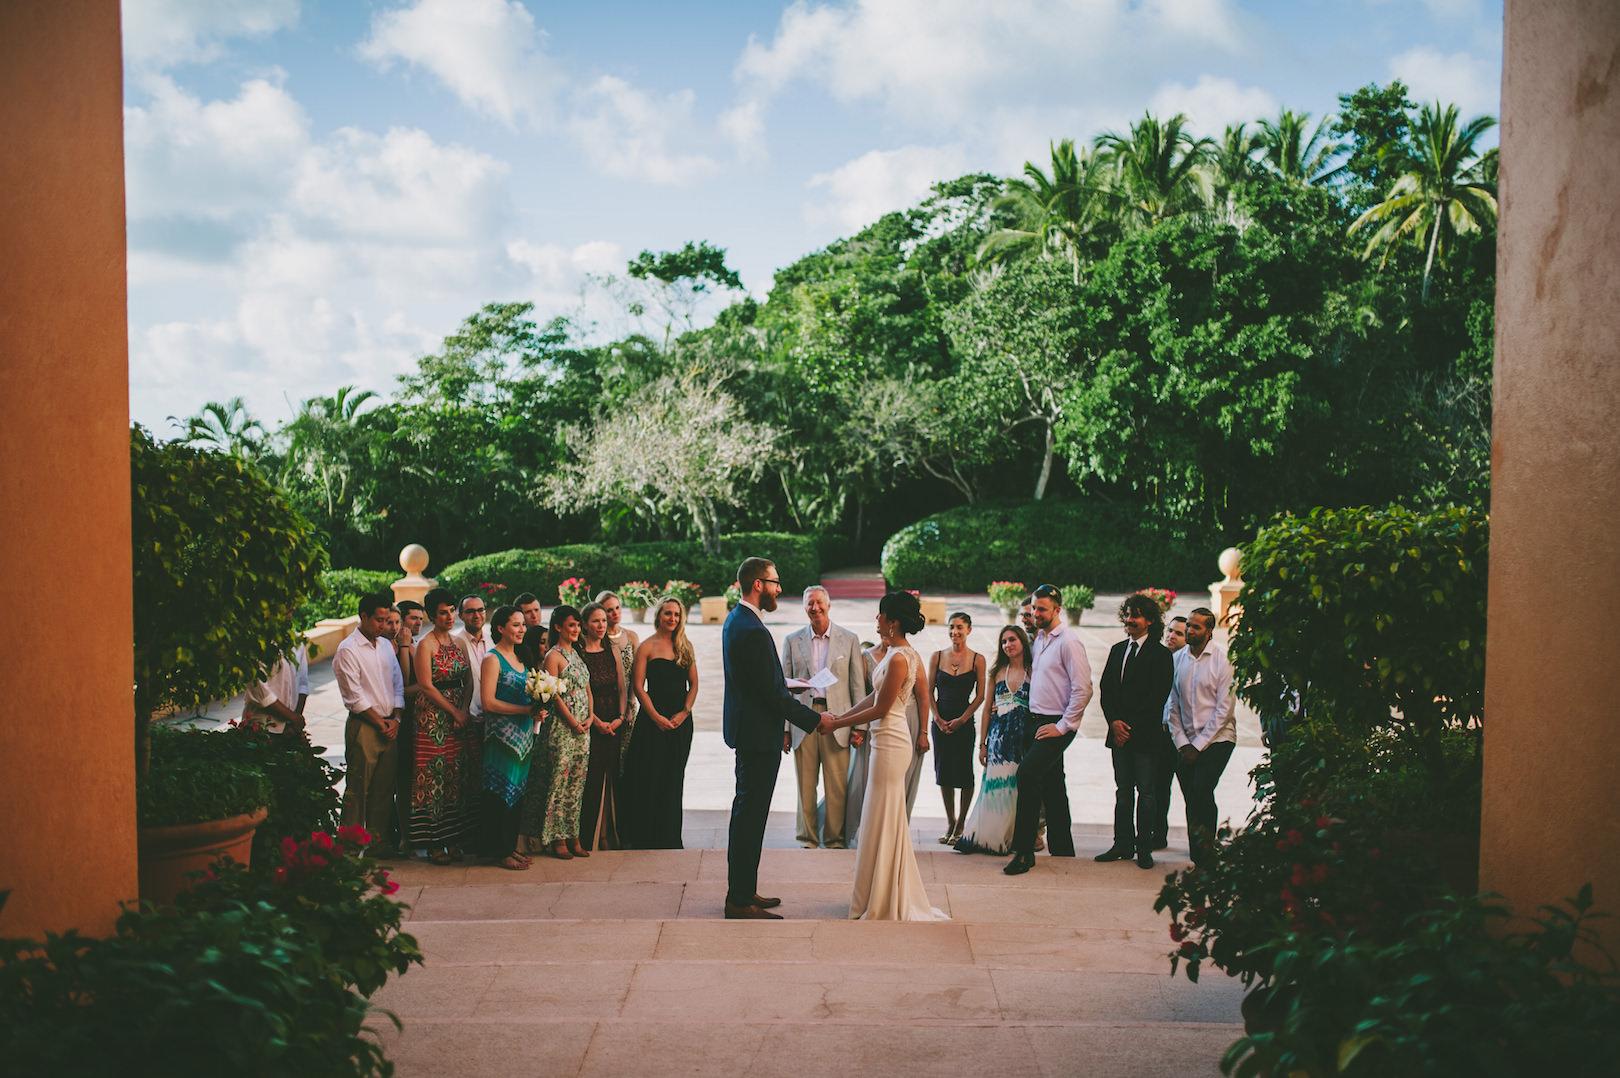 Nathan & Felicia - Wedding Day - © Dallas Kolotylo Photography - 320